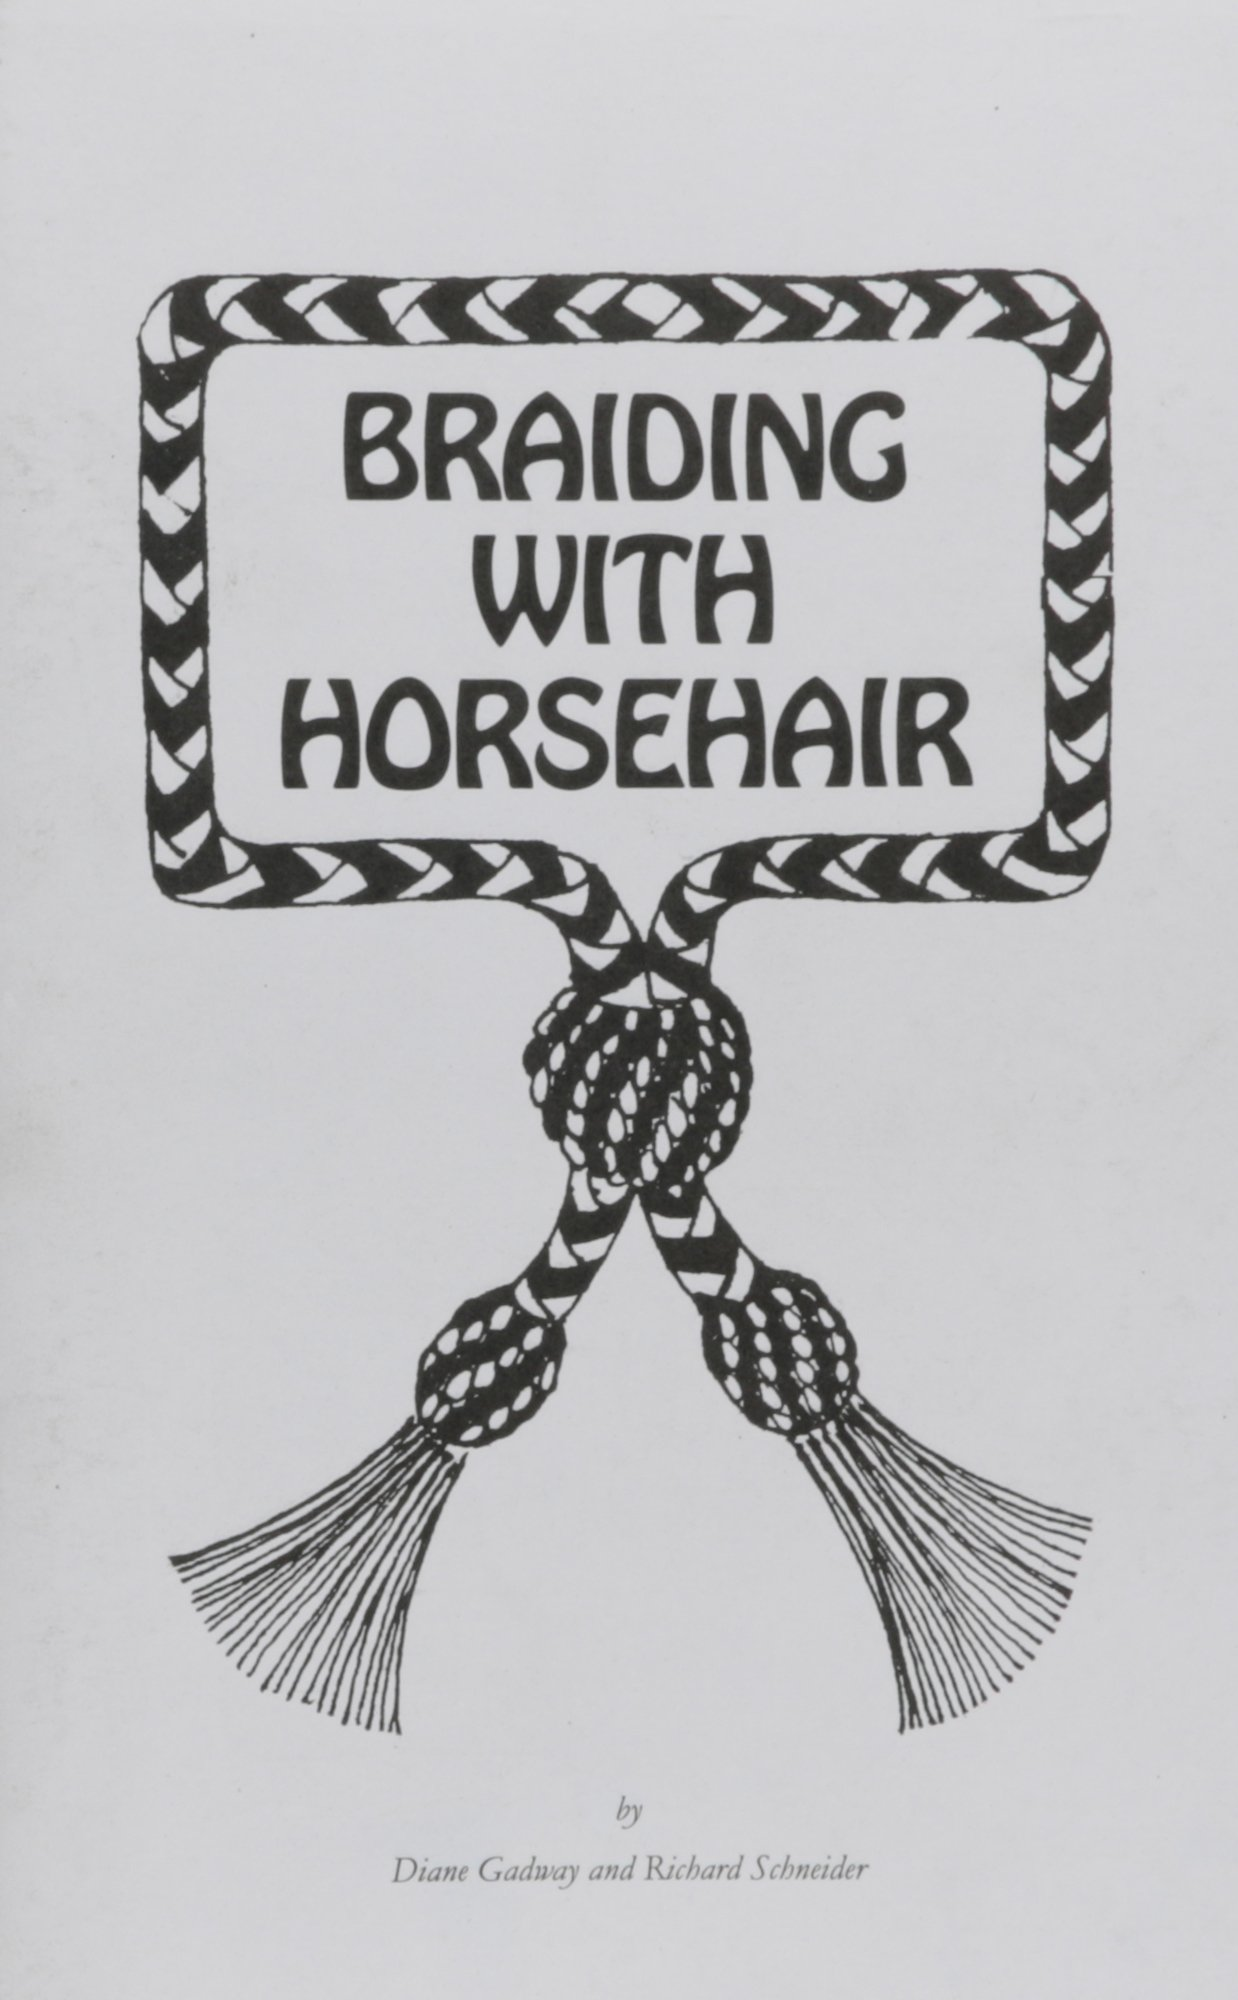 Braiding with horse hair diane gadway richard schneider braiding with horse hair diane gadway richard schneider 9780961375607 amazon books solutioingenieria Image collections